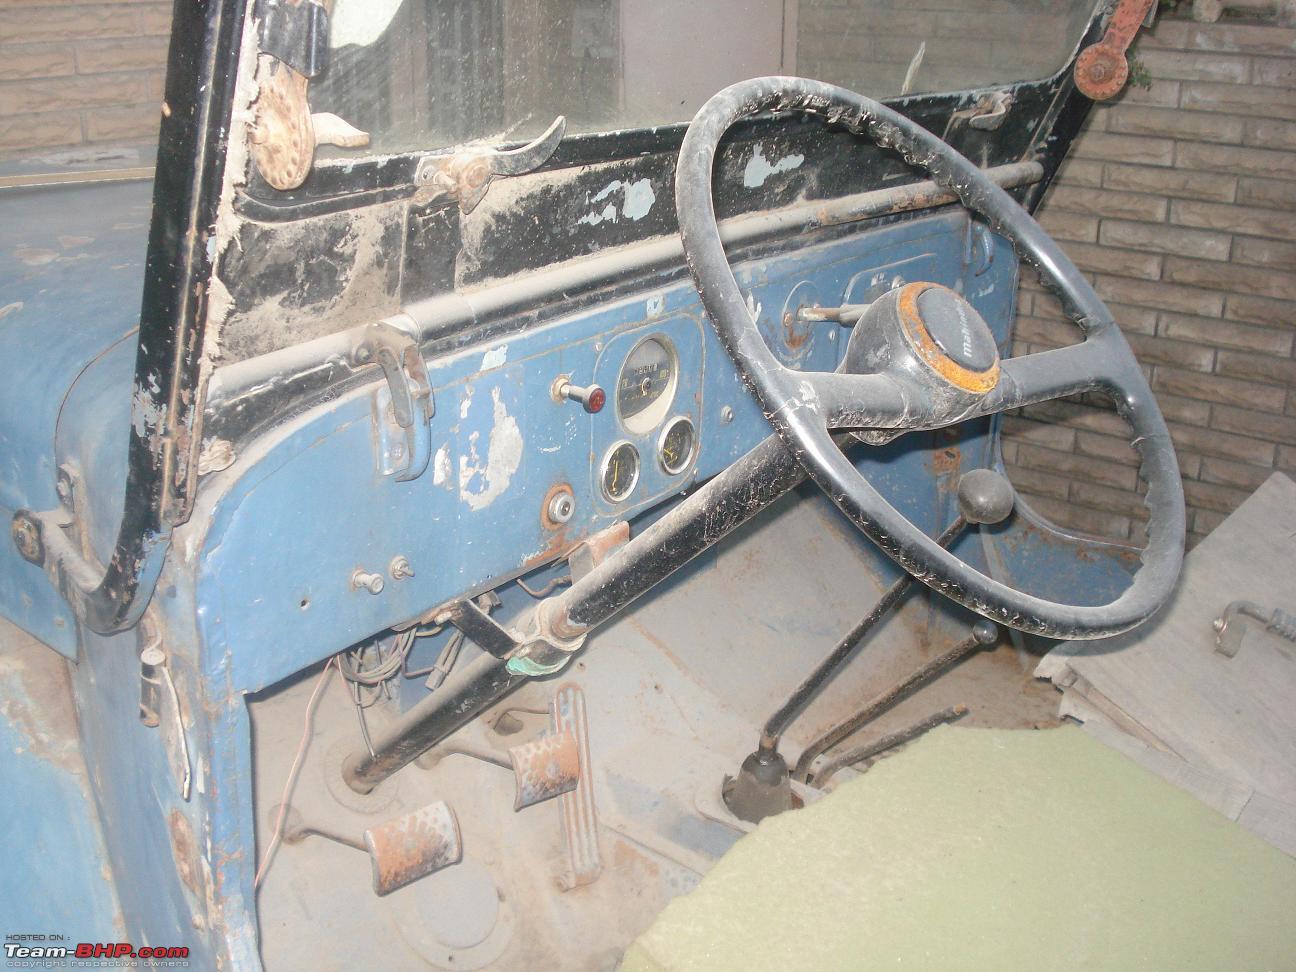 1964 Willys Cj3b Team Bhp Wiring Harness Picture 1086